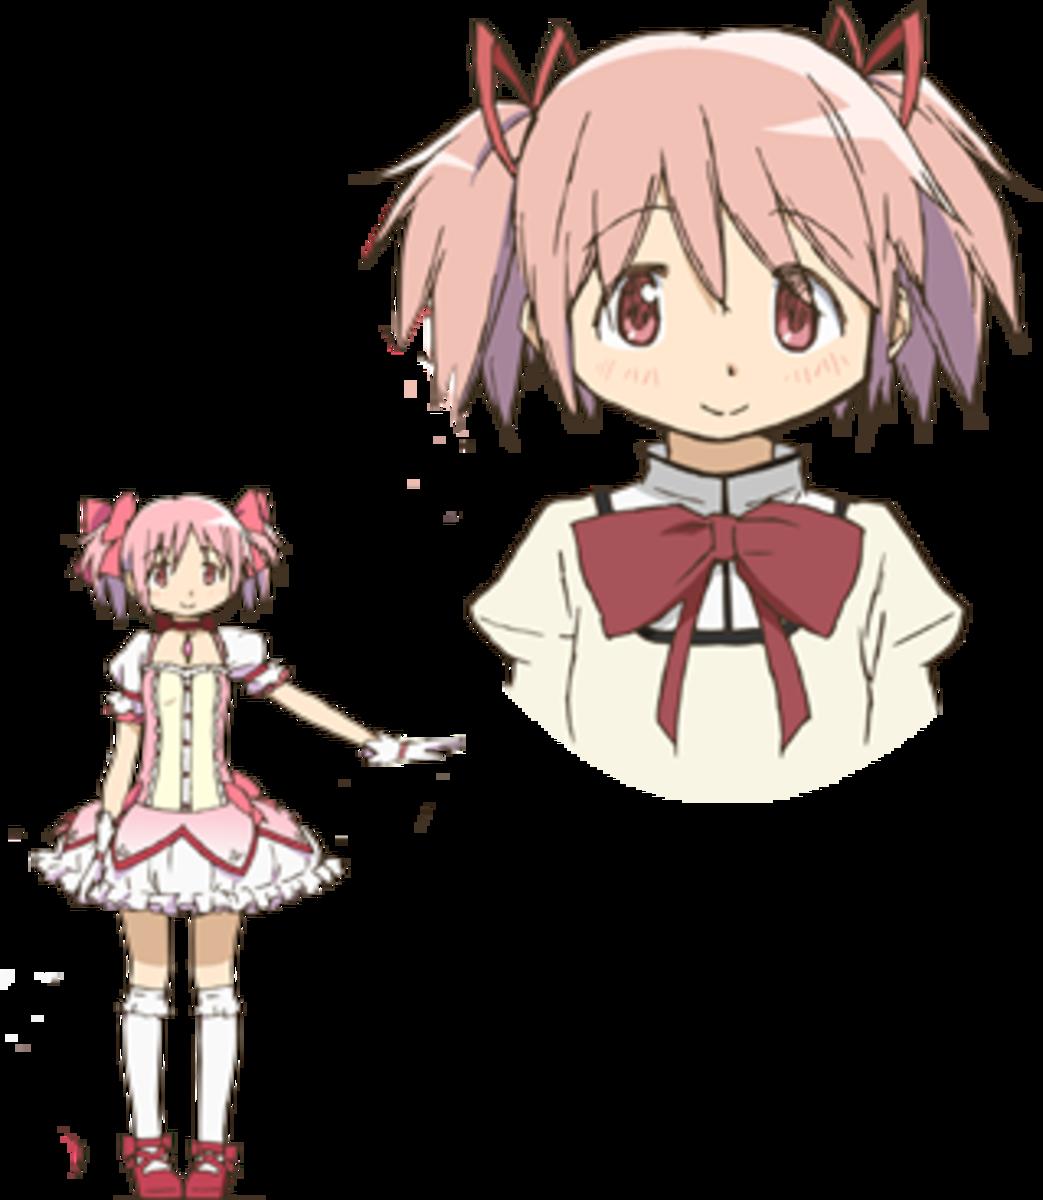 character-discussion-madoka-kaname-puella-magi-madoka-magica